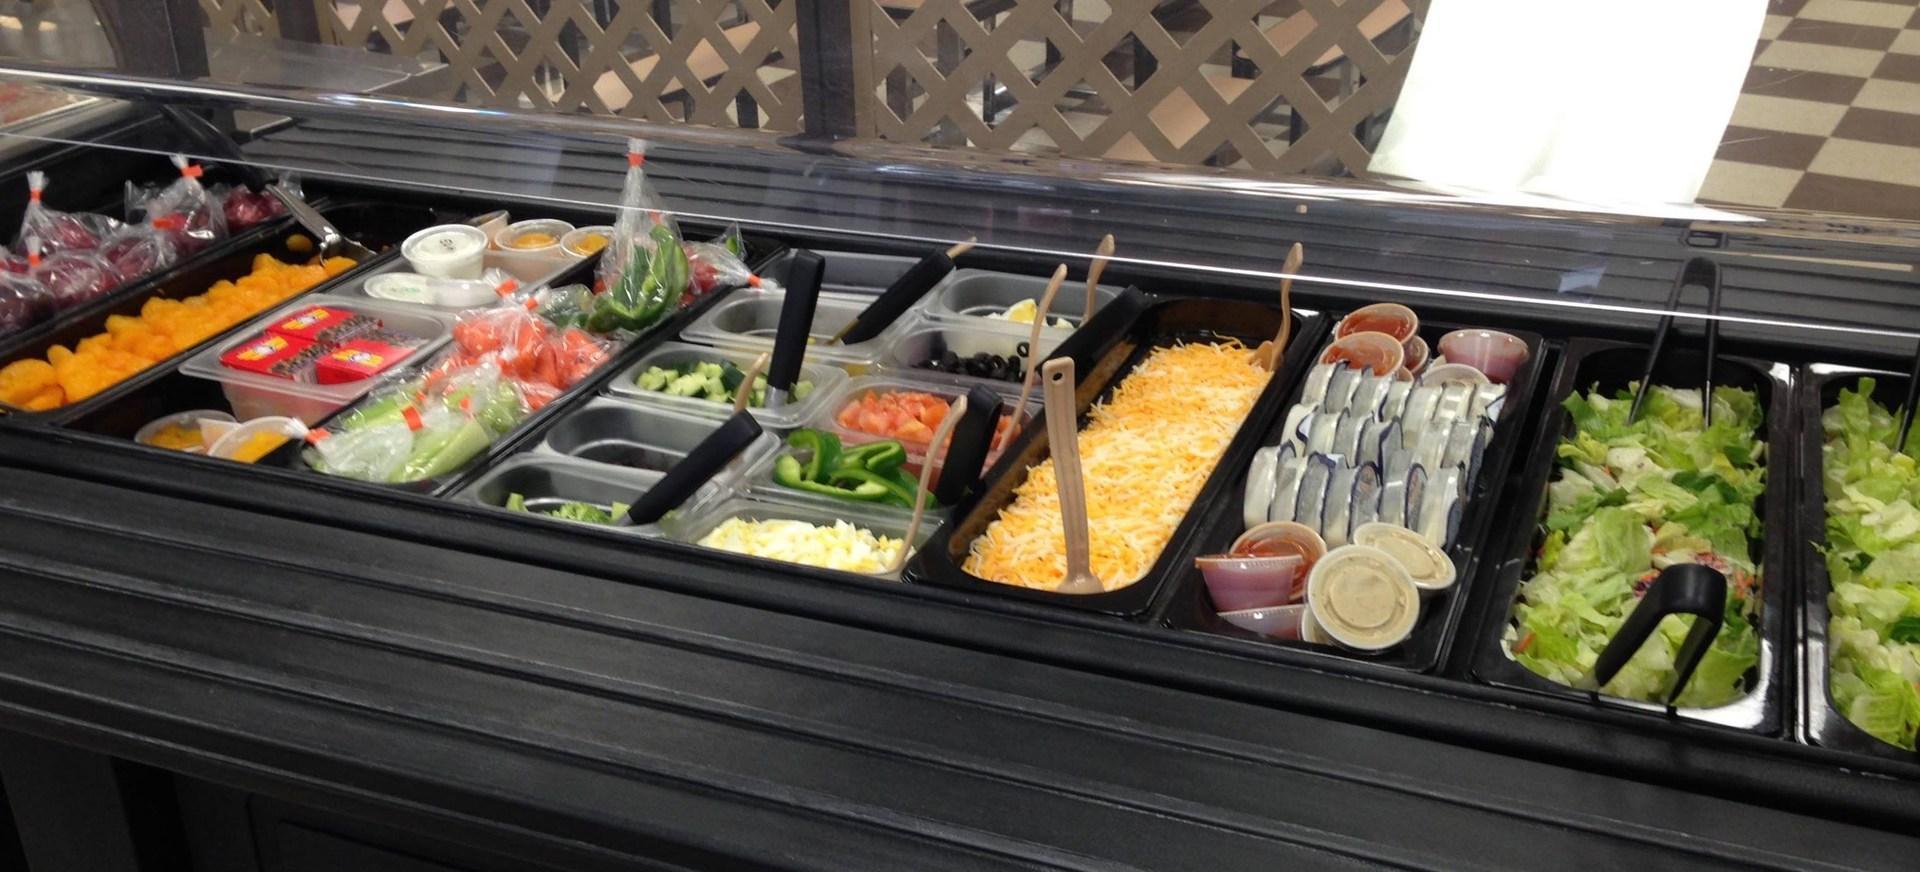 Wabash Middle School Salad Bar